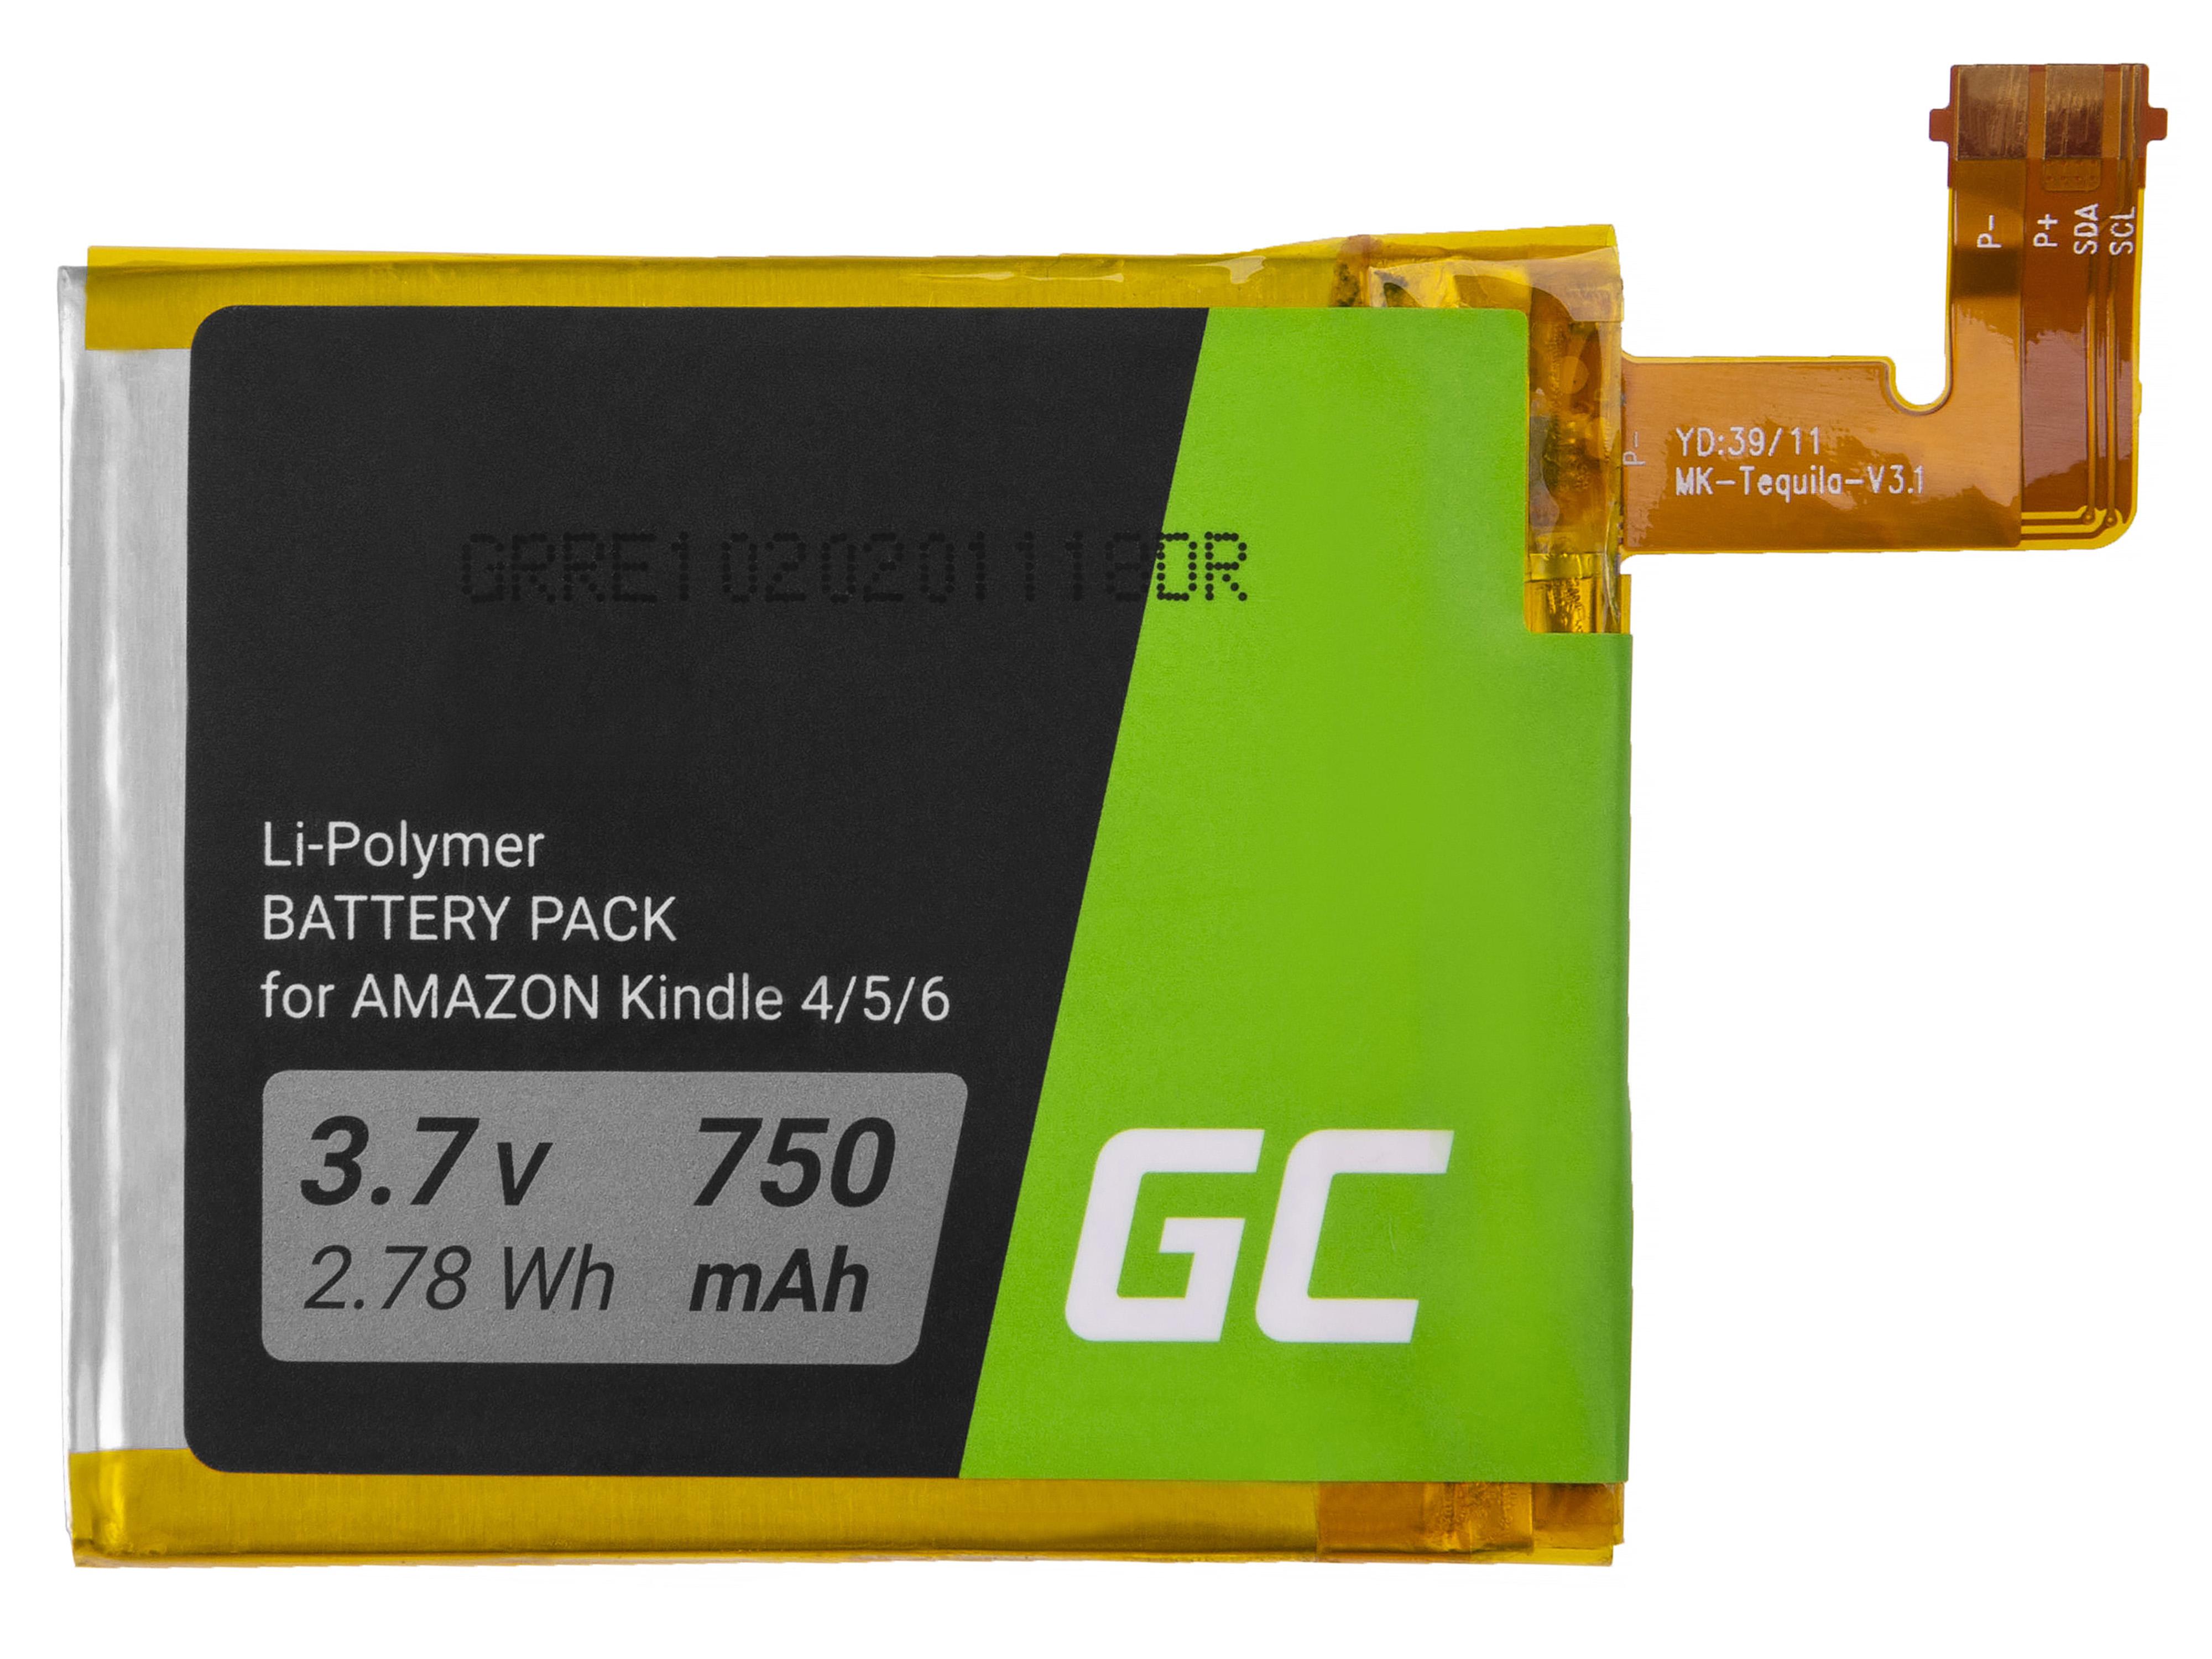 Green cell battery Amazon Kindle 4 / 5 / 6, 750 mAh